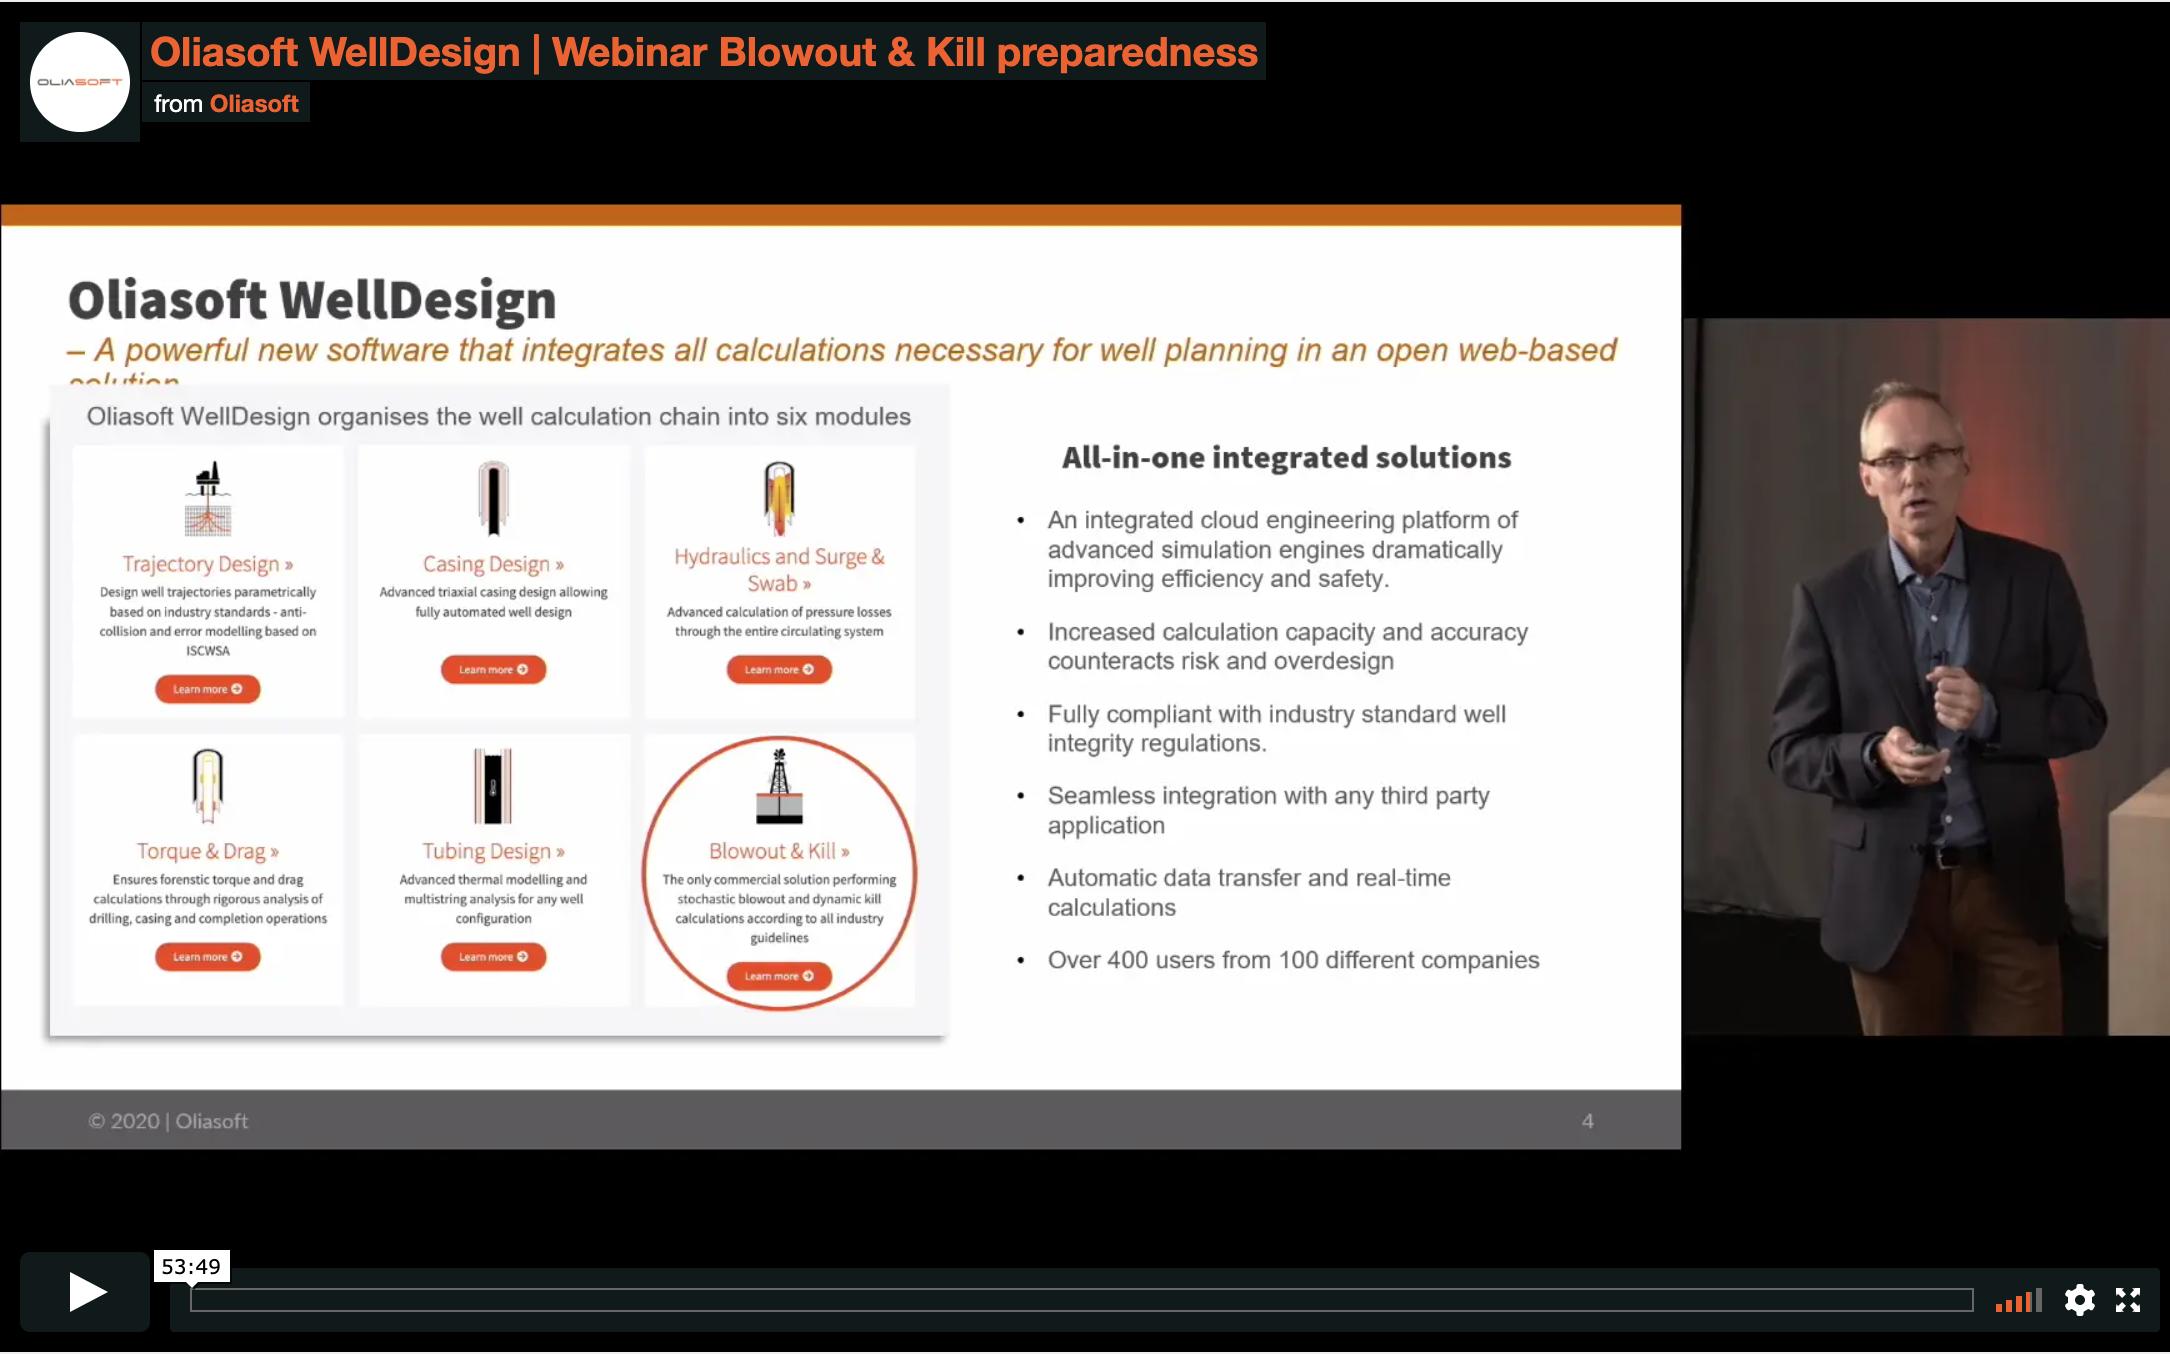 Oliasoft WellDesign Blowout & Kill preparedness webinar